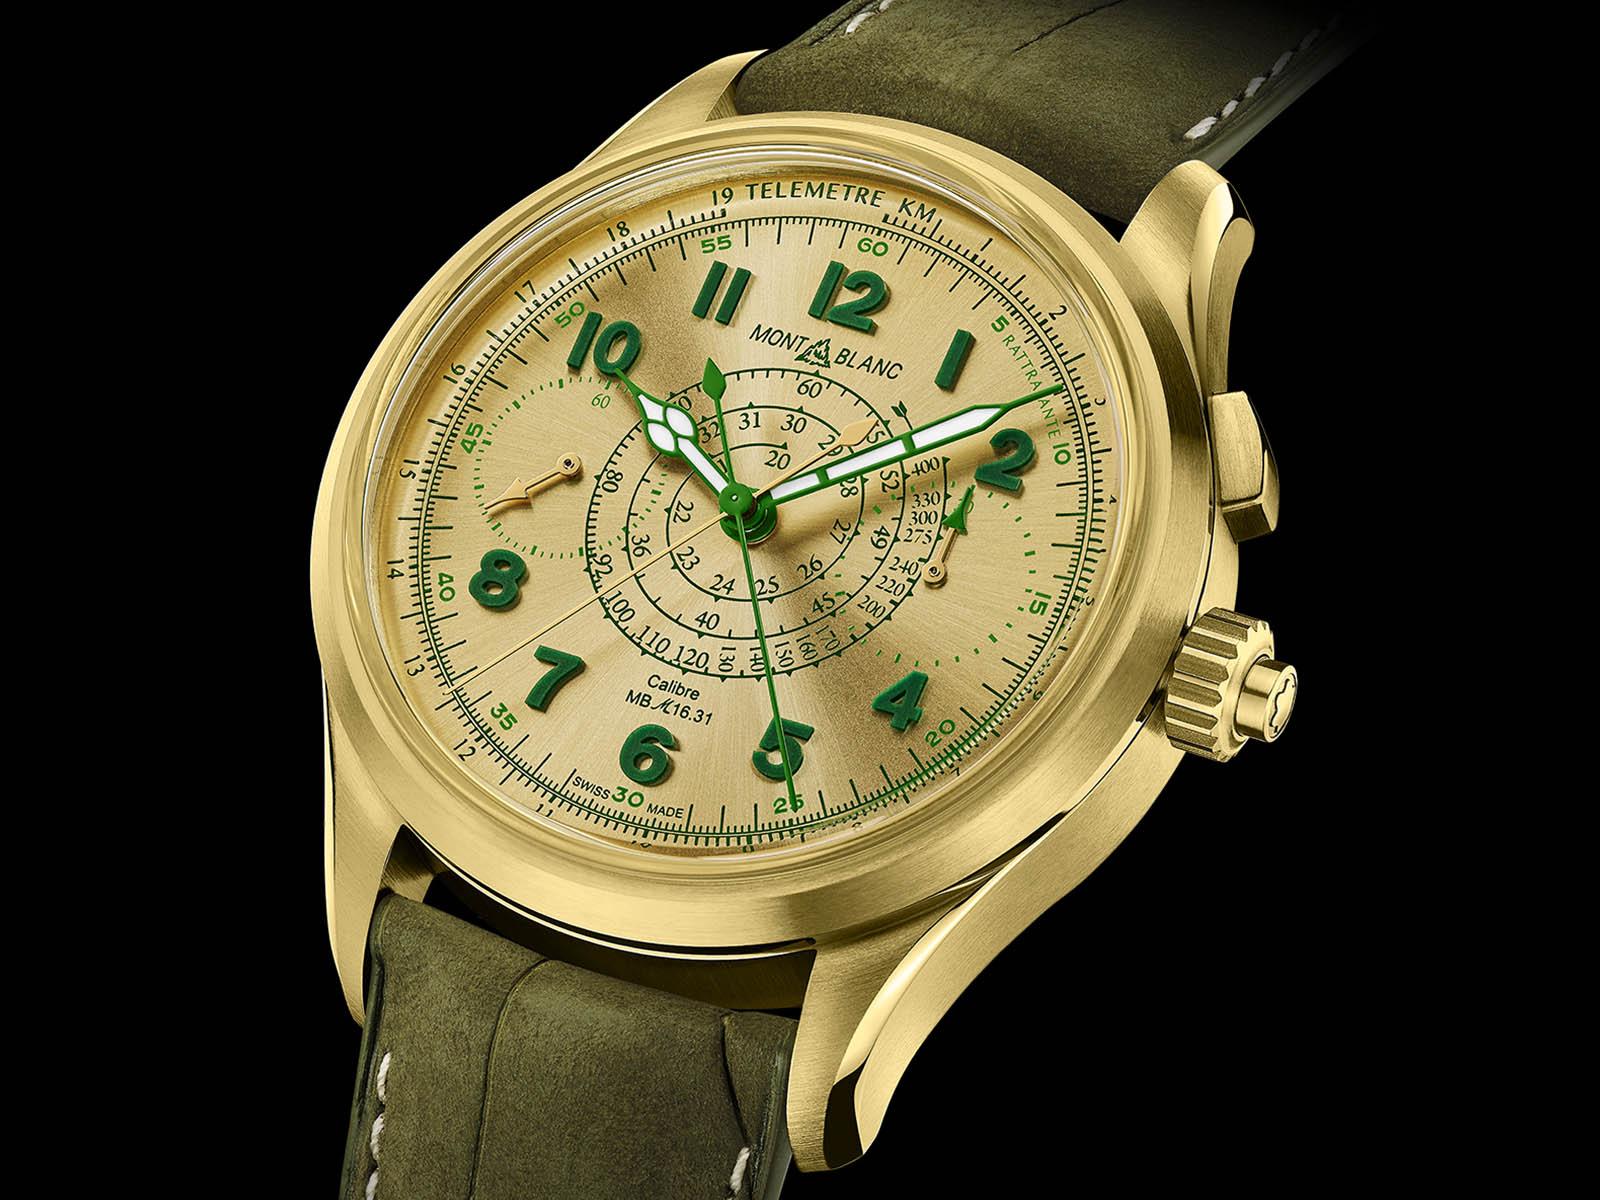 128085-montblanc-1858-split-second-chronograph-limited-edition-18-3.jpg